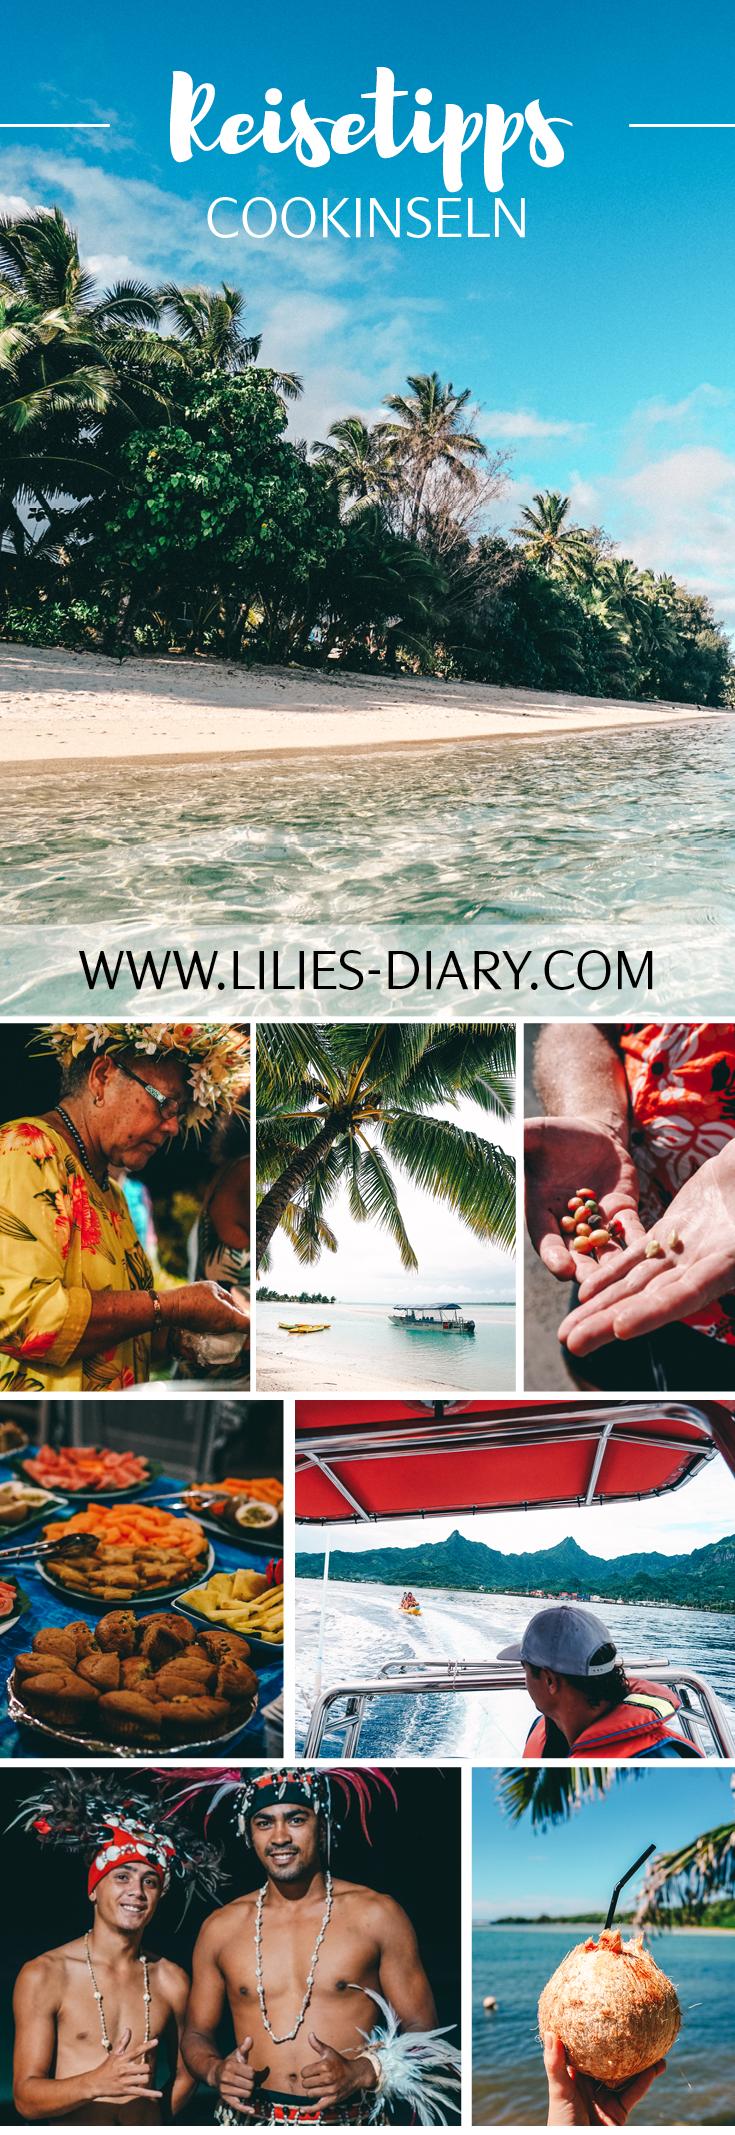 Cookinseln Reisetipps